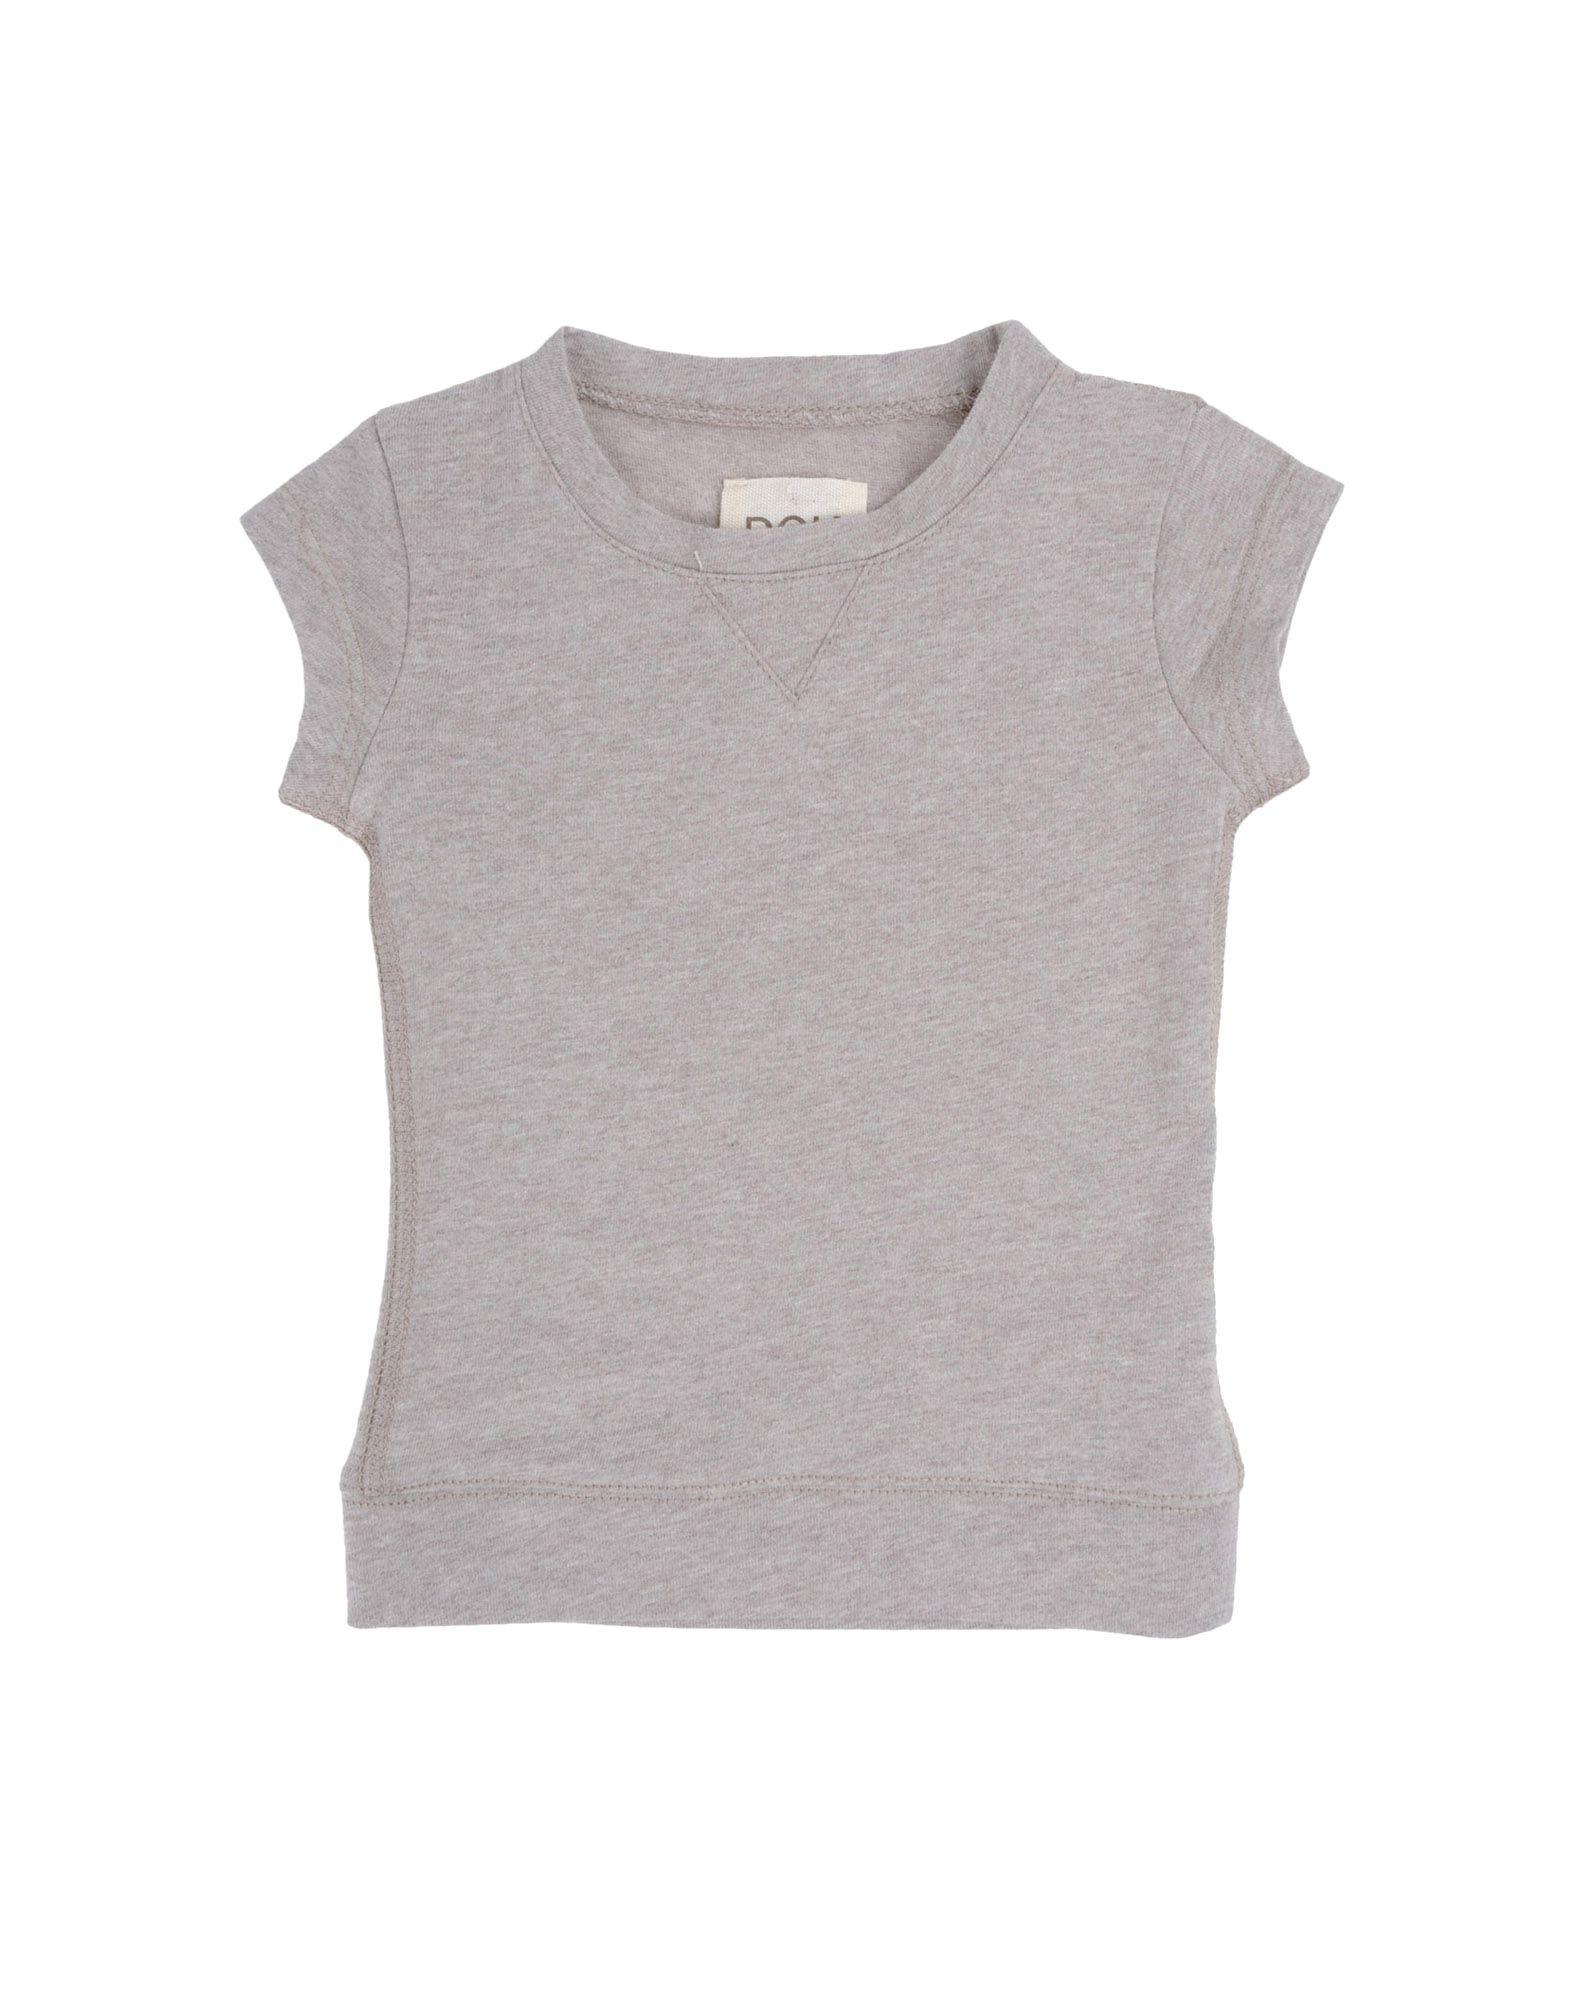 DOUUOD Mädchen 0-24 monate Kurzärmliges T-Shirt Farbe Taubengrau Größe 4